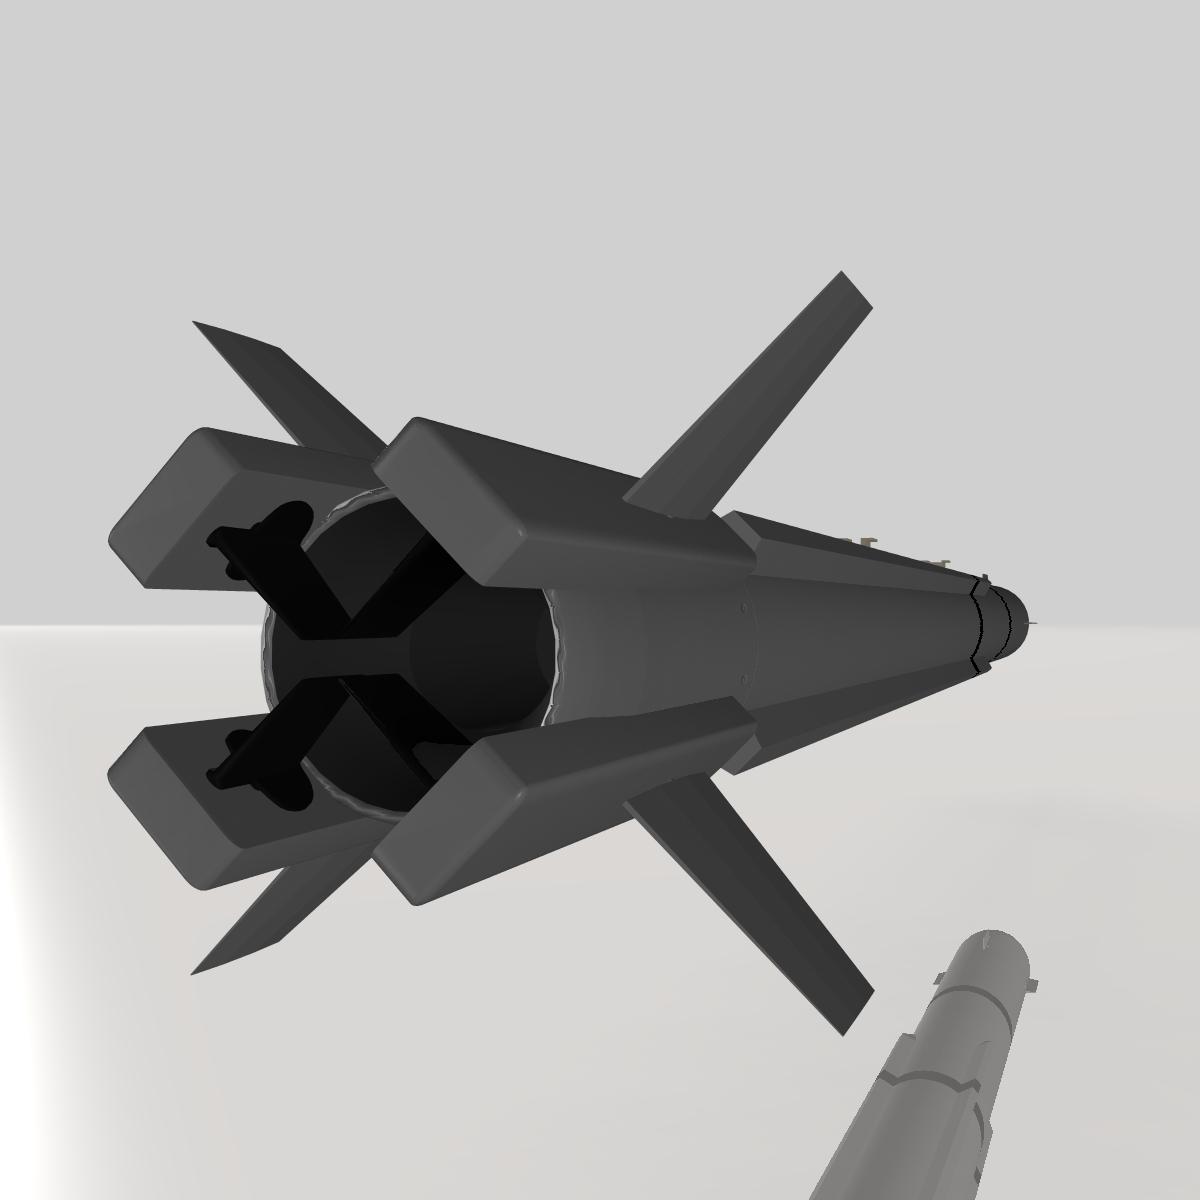 a-darter air-to-air пуужин 3d загвар 3ds dxf cob x obj 151882